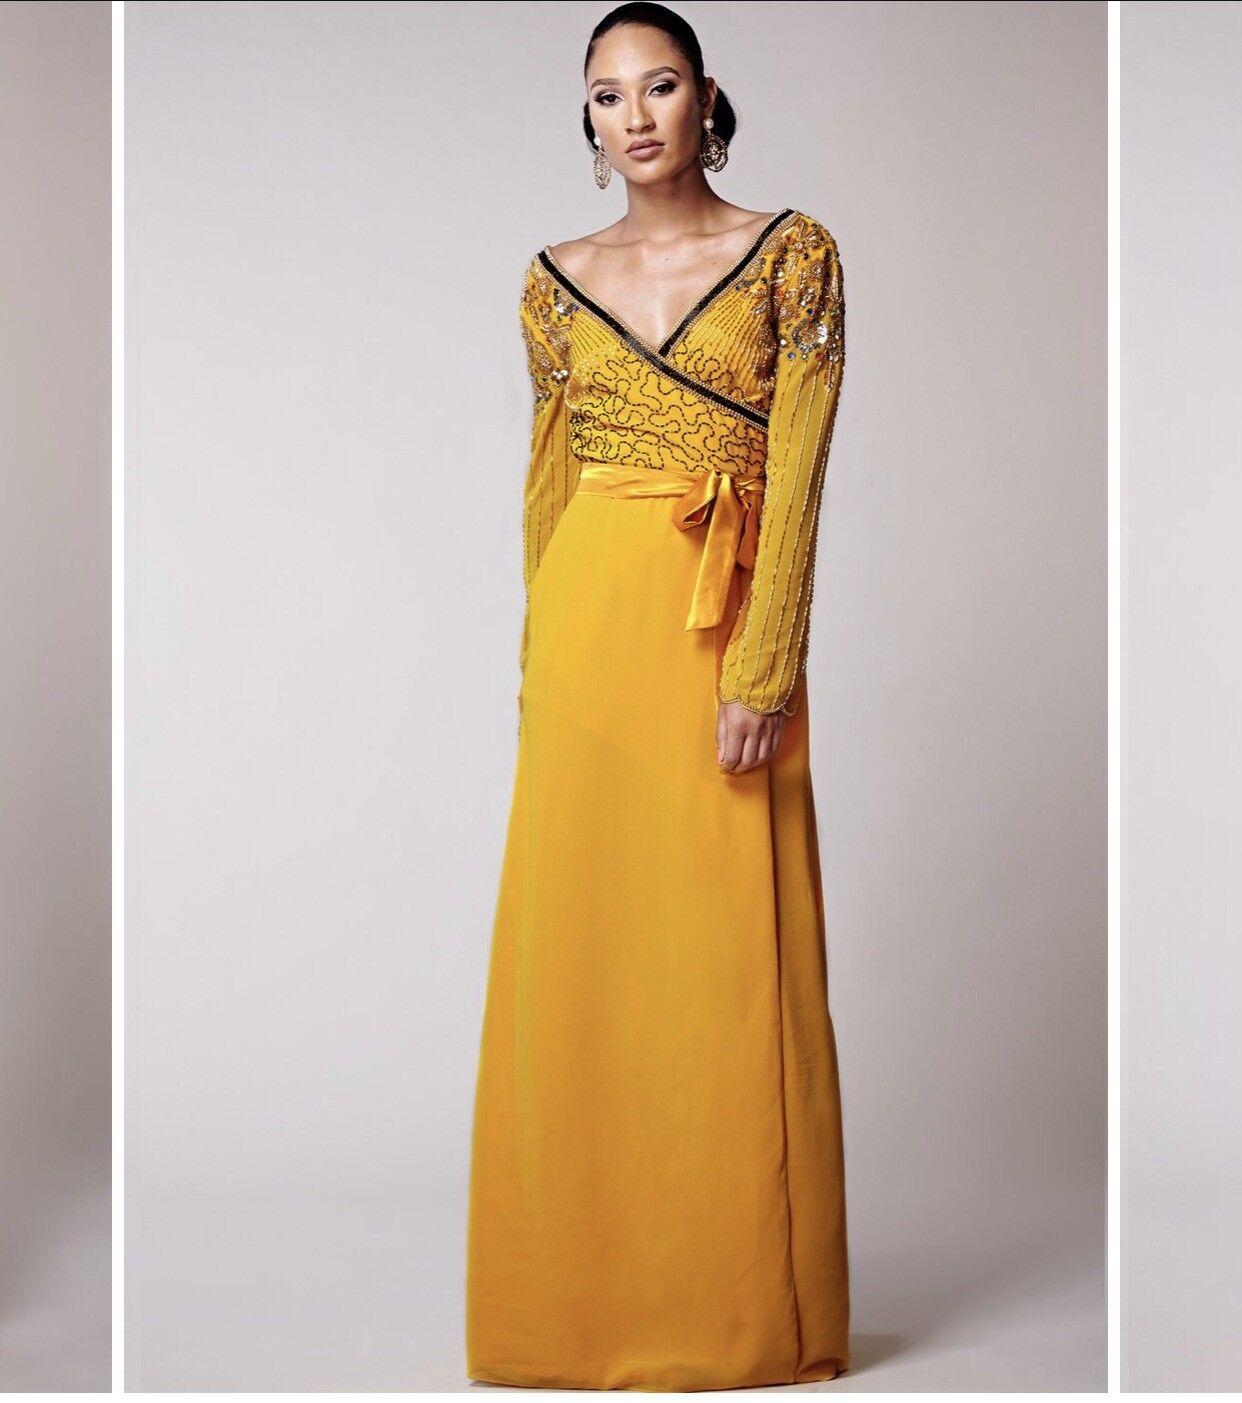 Dress 12 BNWT Virgos Lounge Embellished Maxi Wedding Prom Occassion RRP